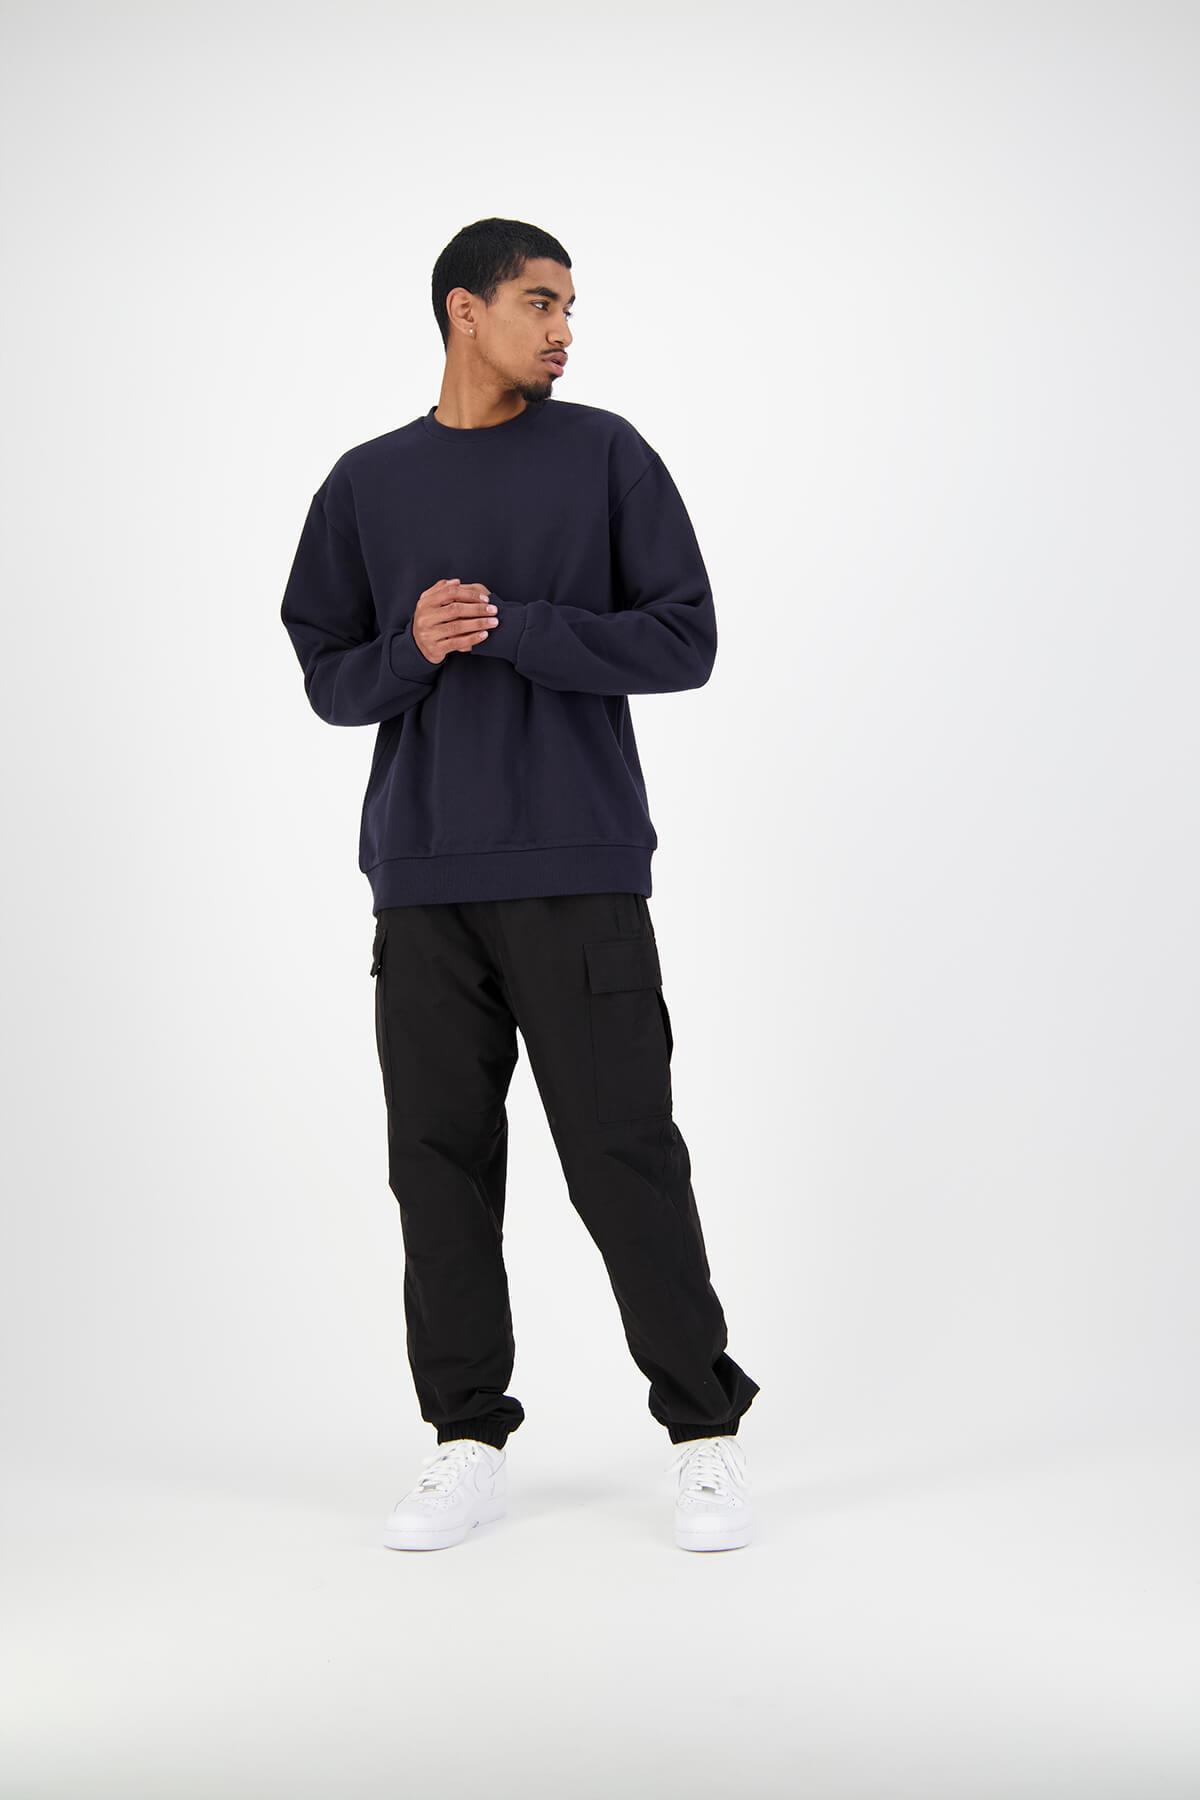 Huffer male model in studio wearing navy crewneck